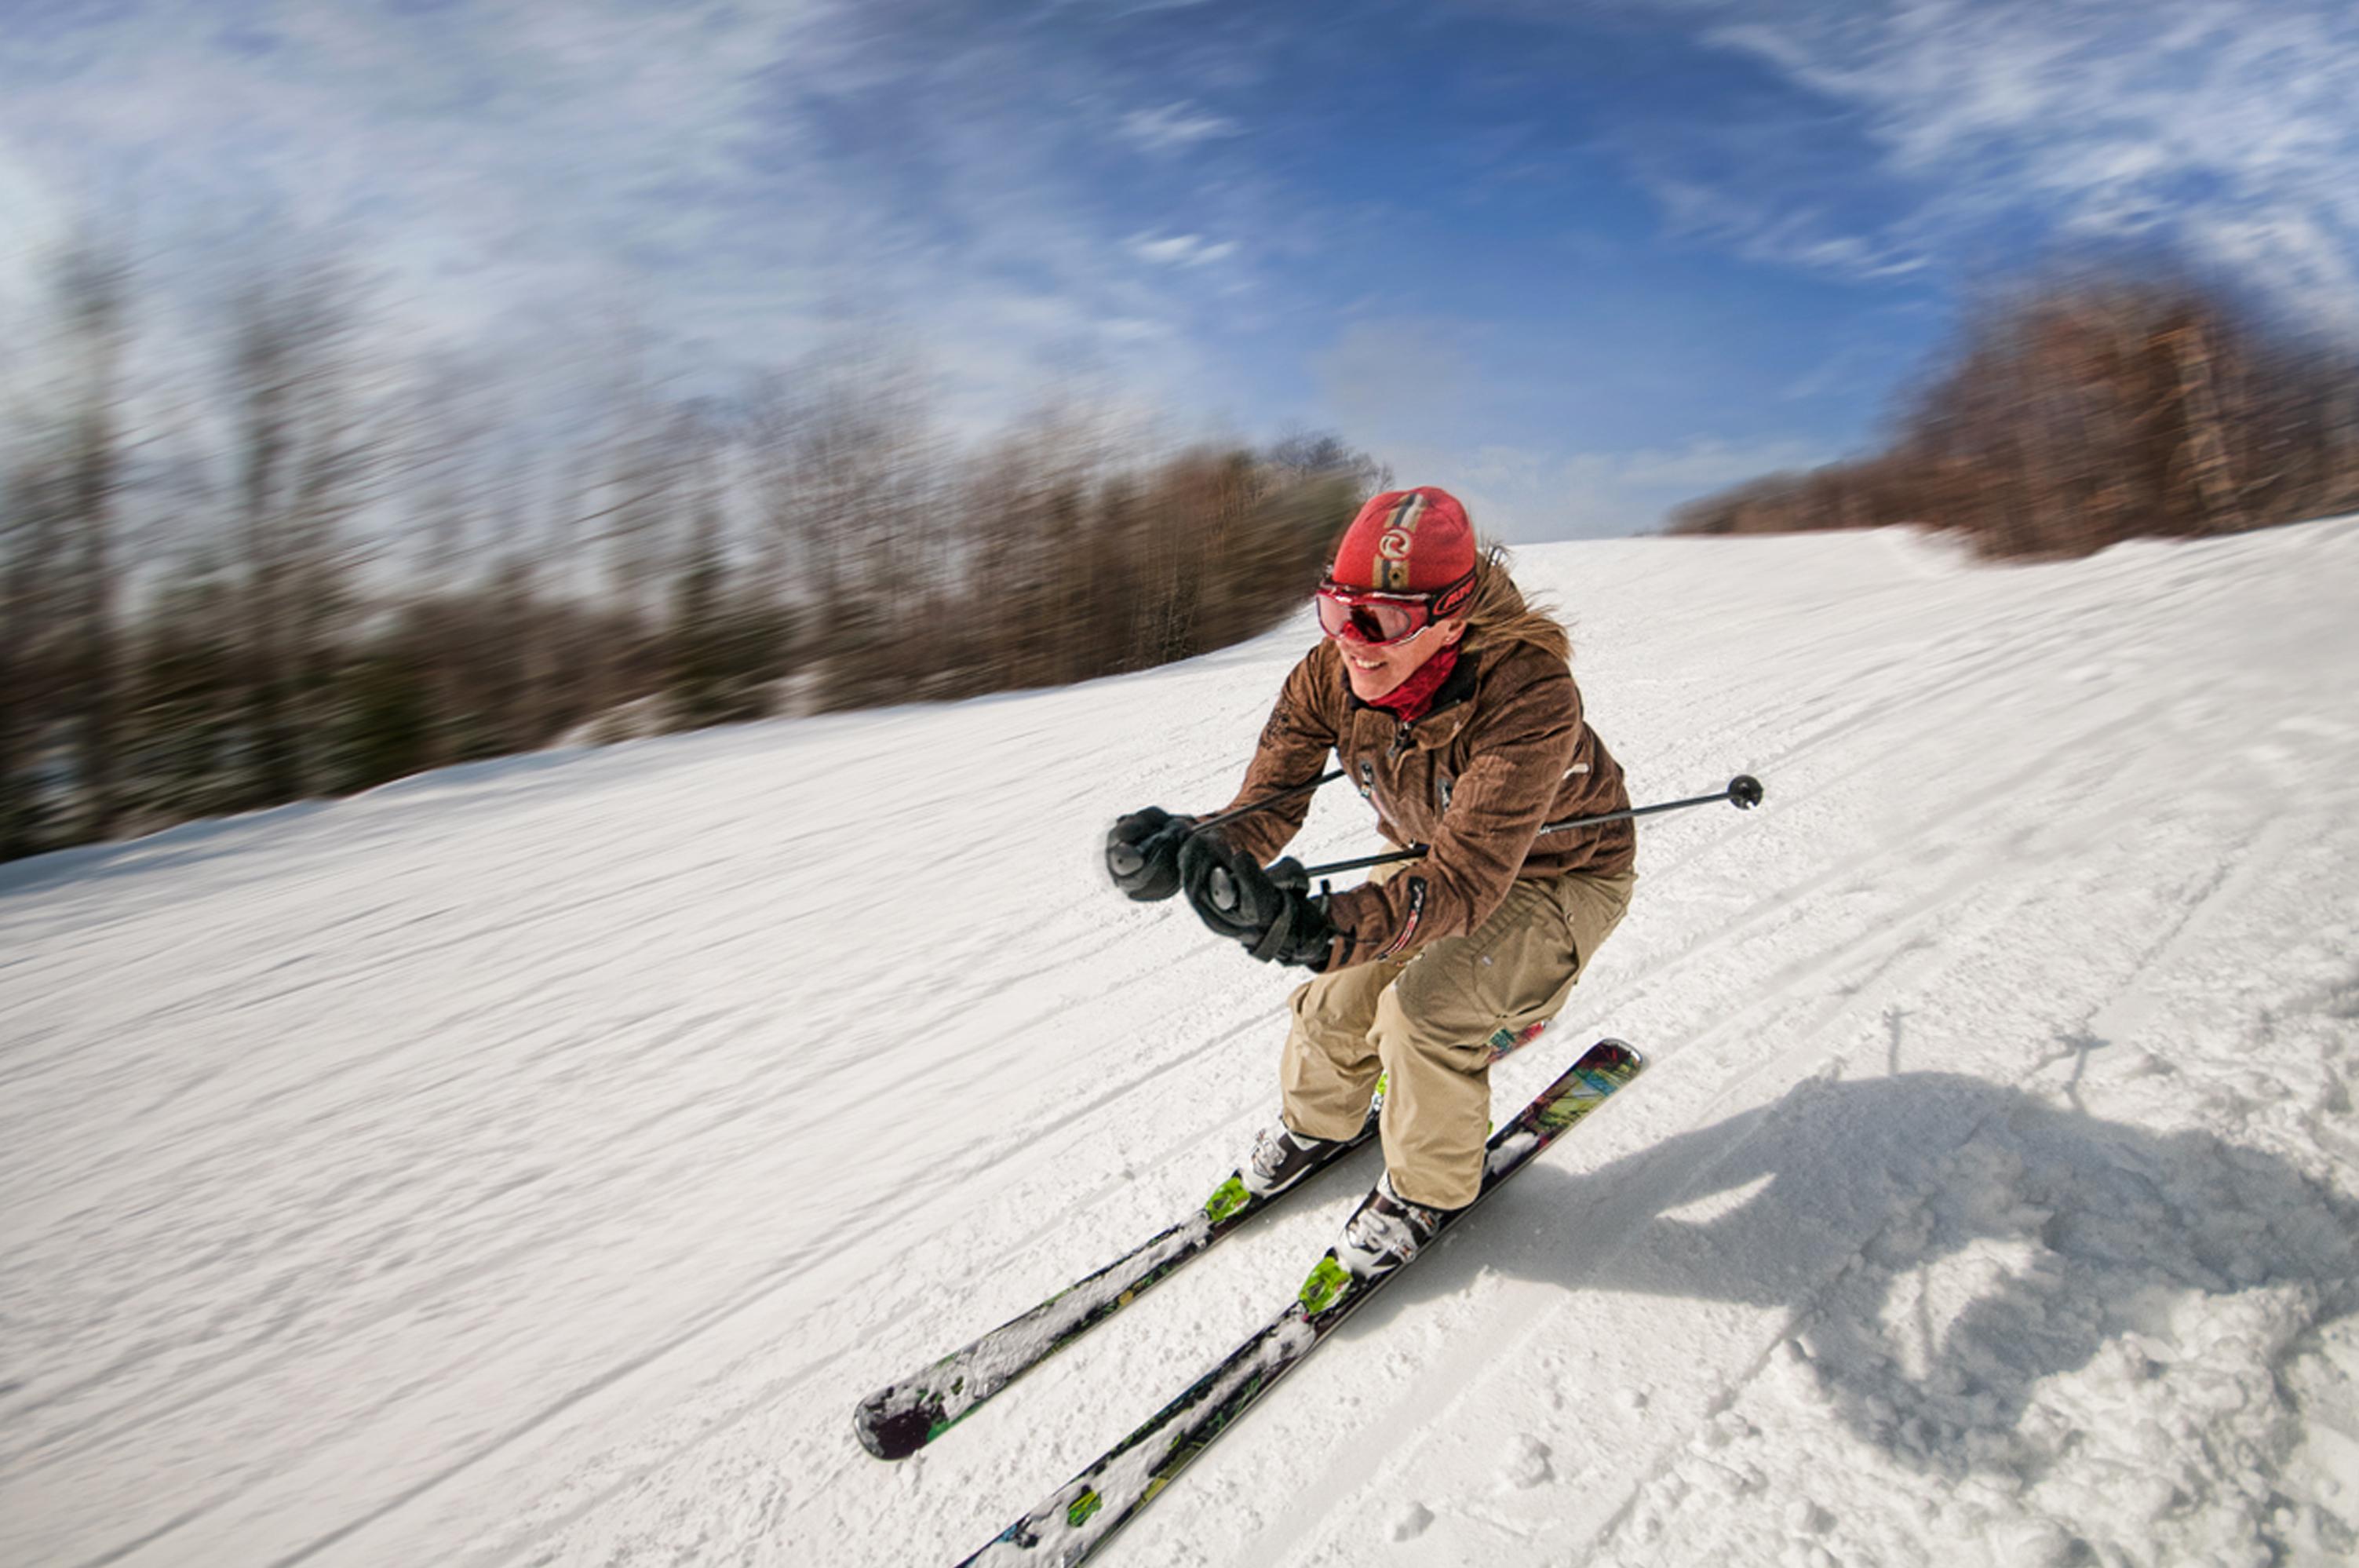 Municipalit de saint c me ski de fond lanaudi re - Montagne coupee ski de fond ...